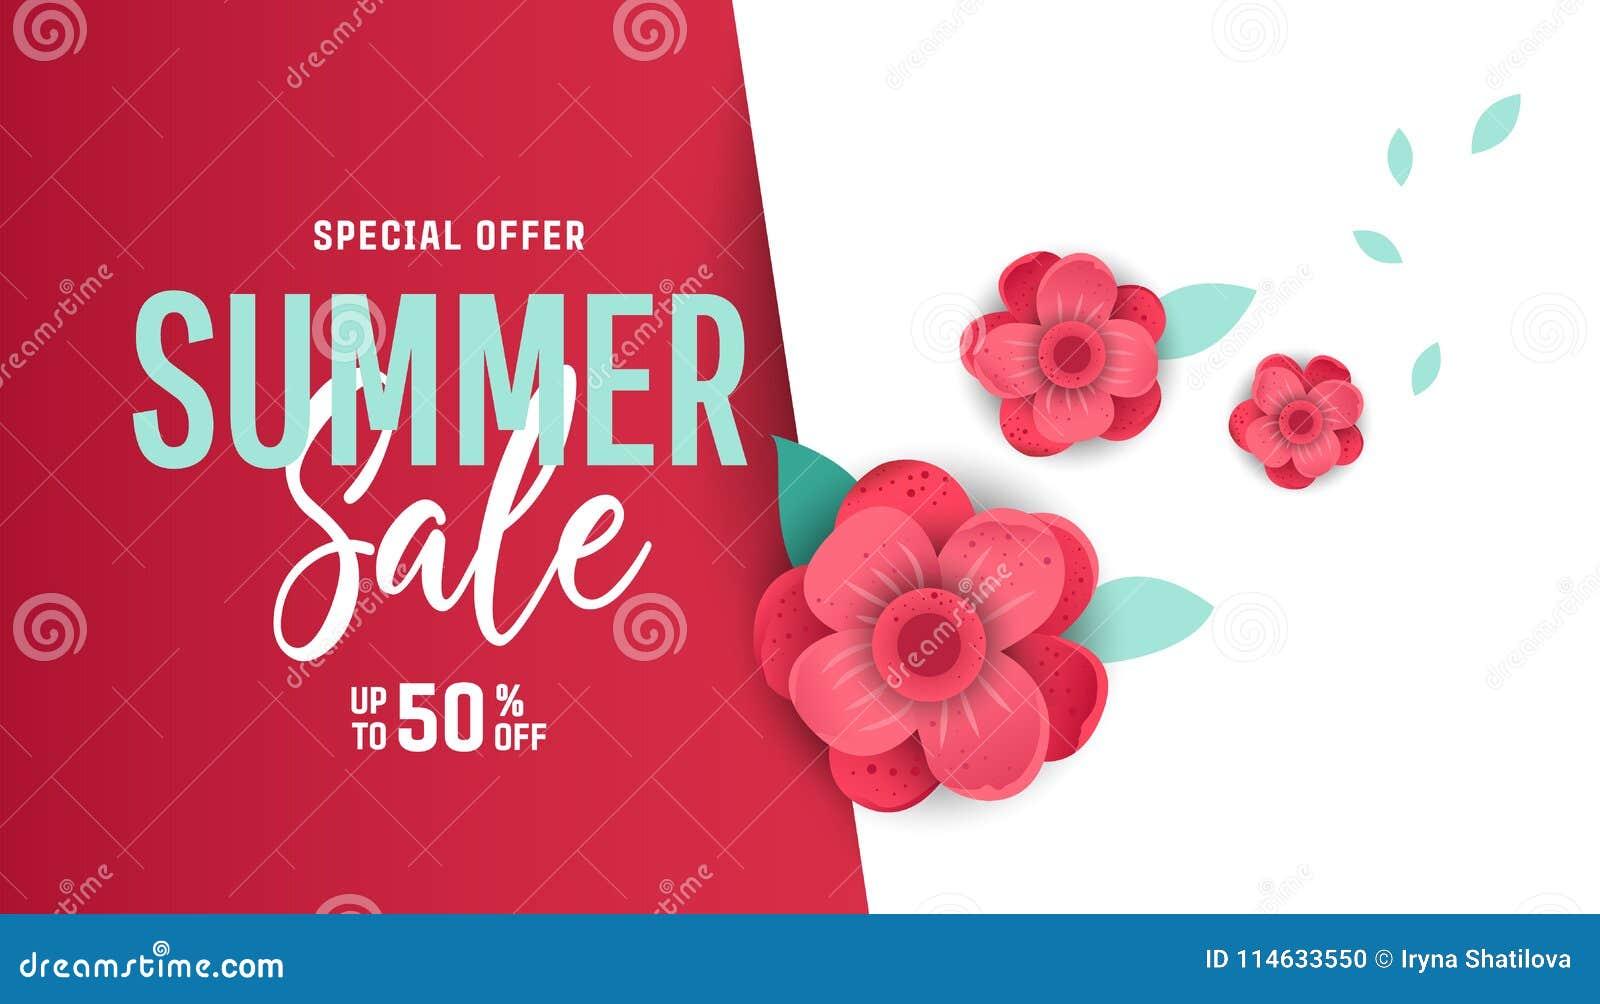 Trendy Poster Designs: Bright Summer Sale Banner, Poster In Trendy Design Stock